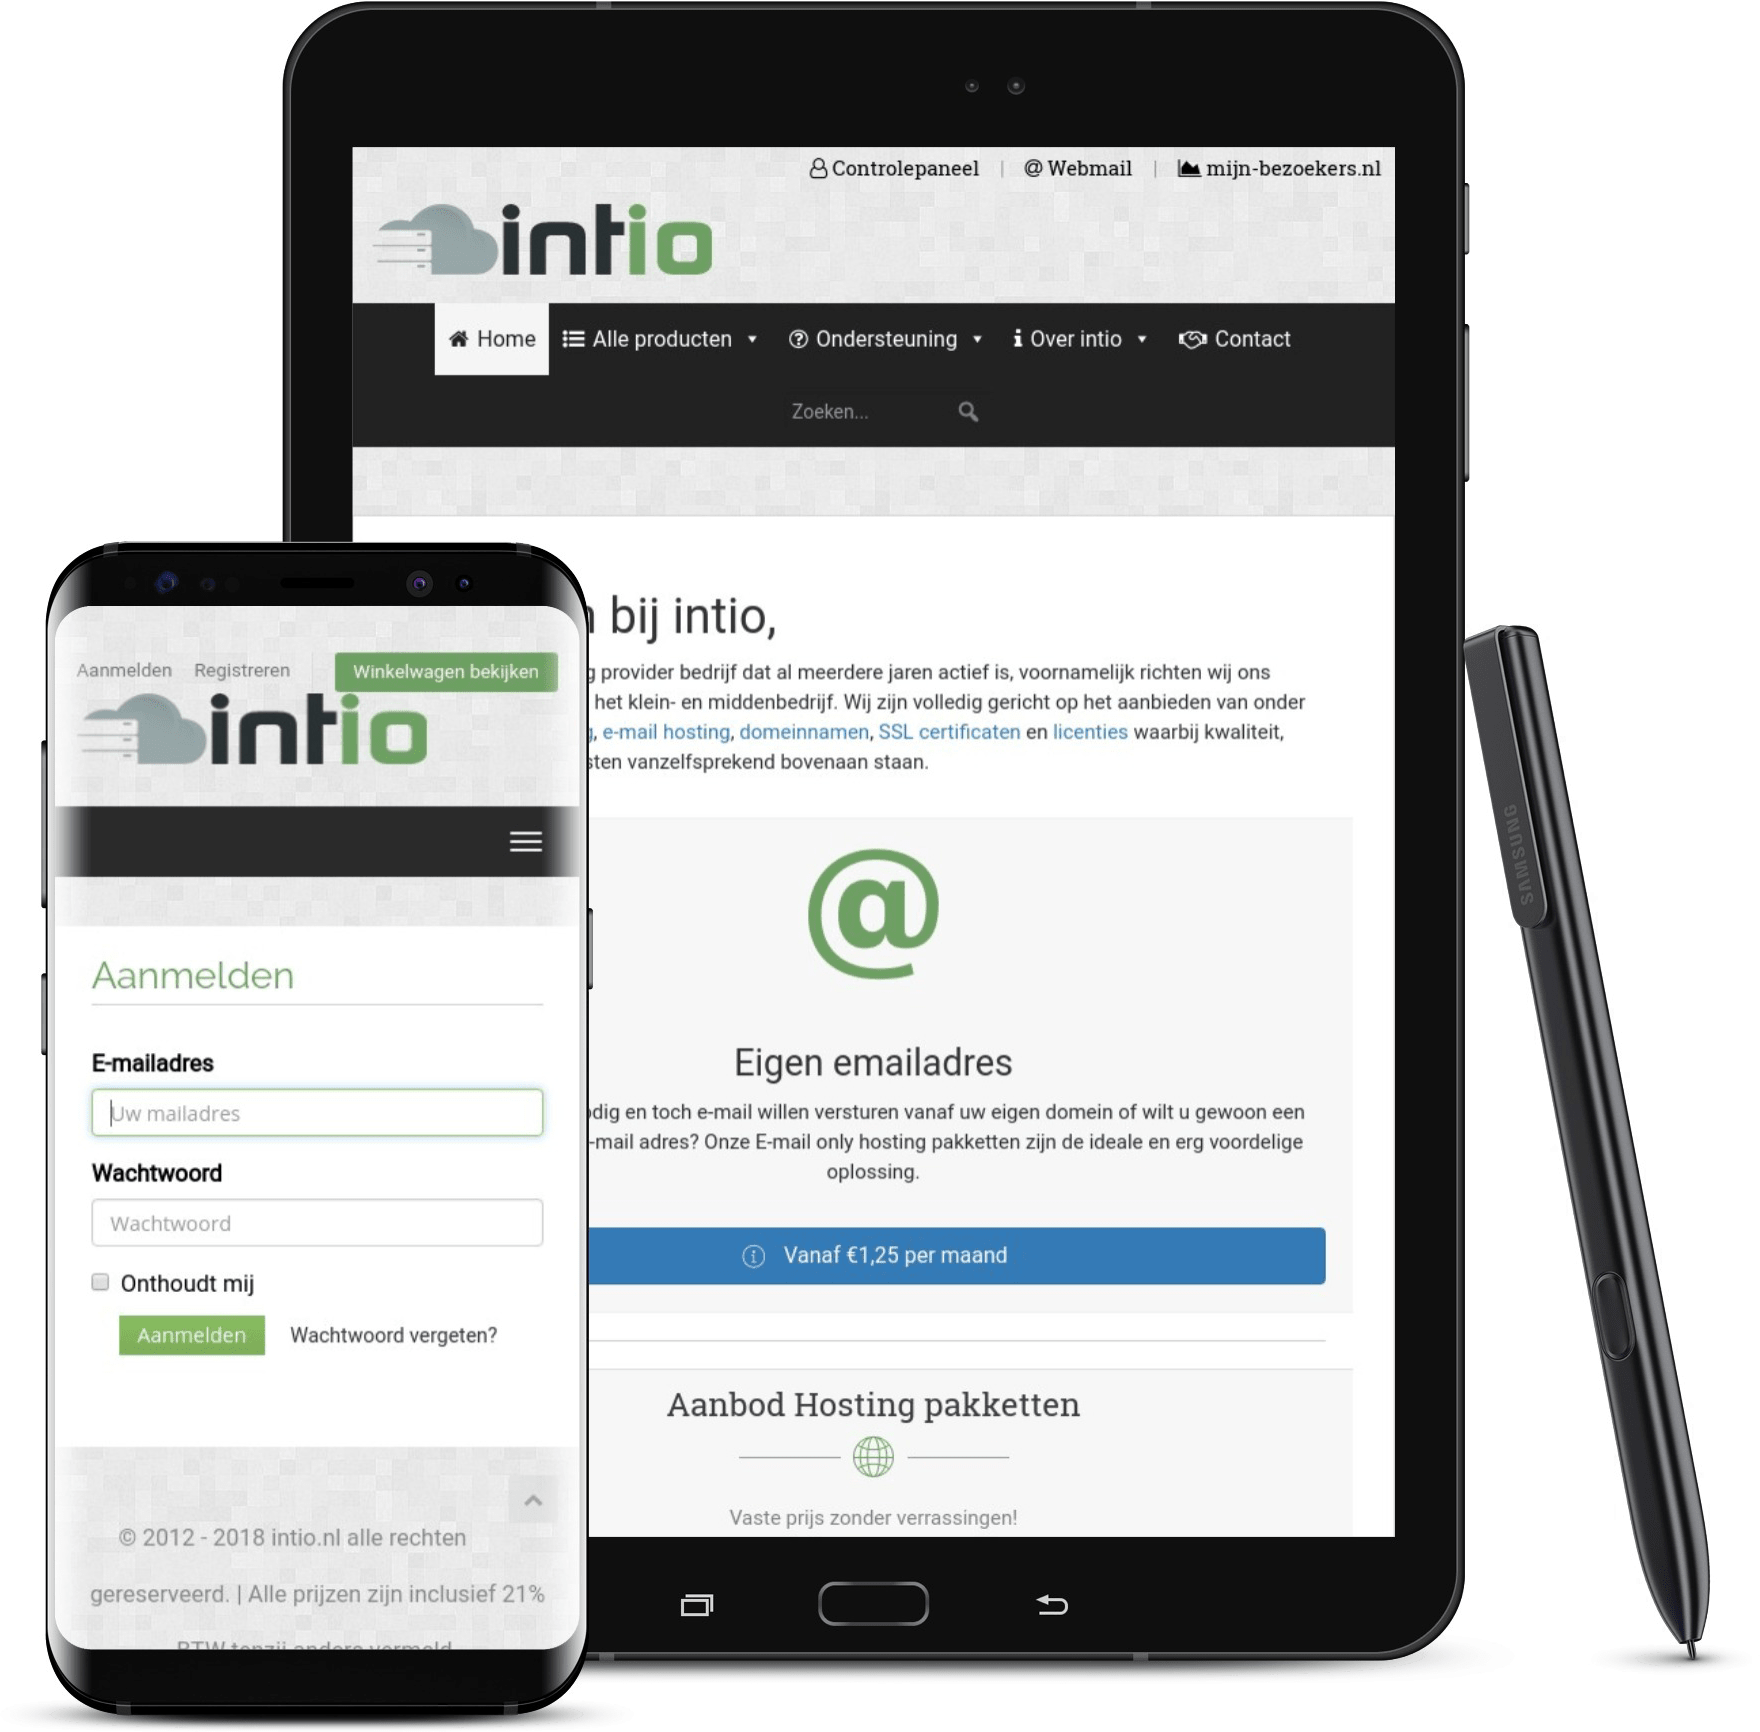 intio hostingpakketten aanbod